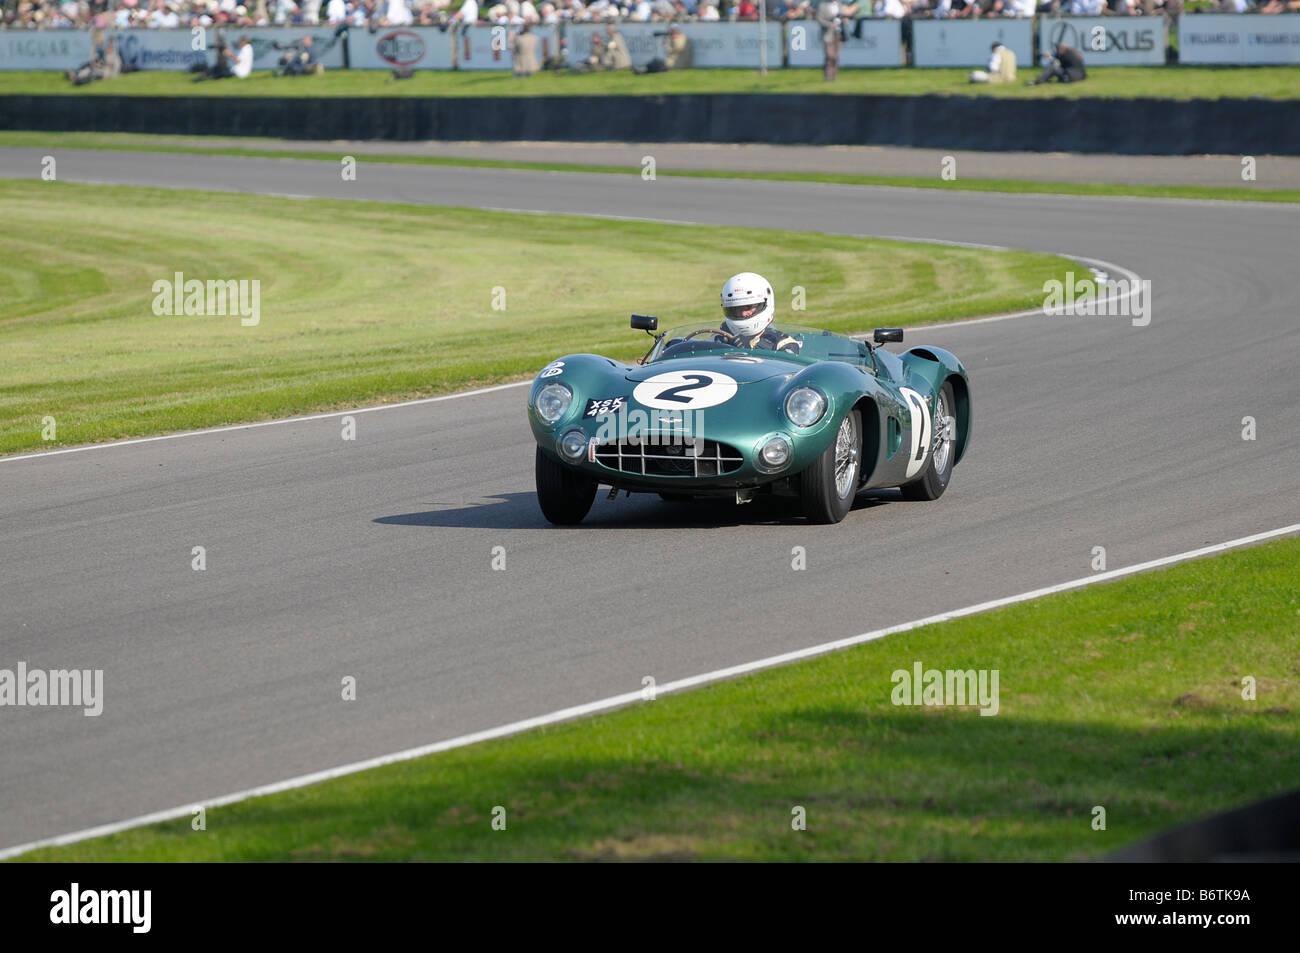 Beim Goodwood Revival meeting September 2008 Aston Martin DBR1 2992cc 1957 Tony Dron Stockbild